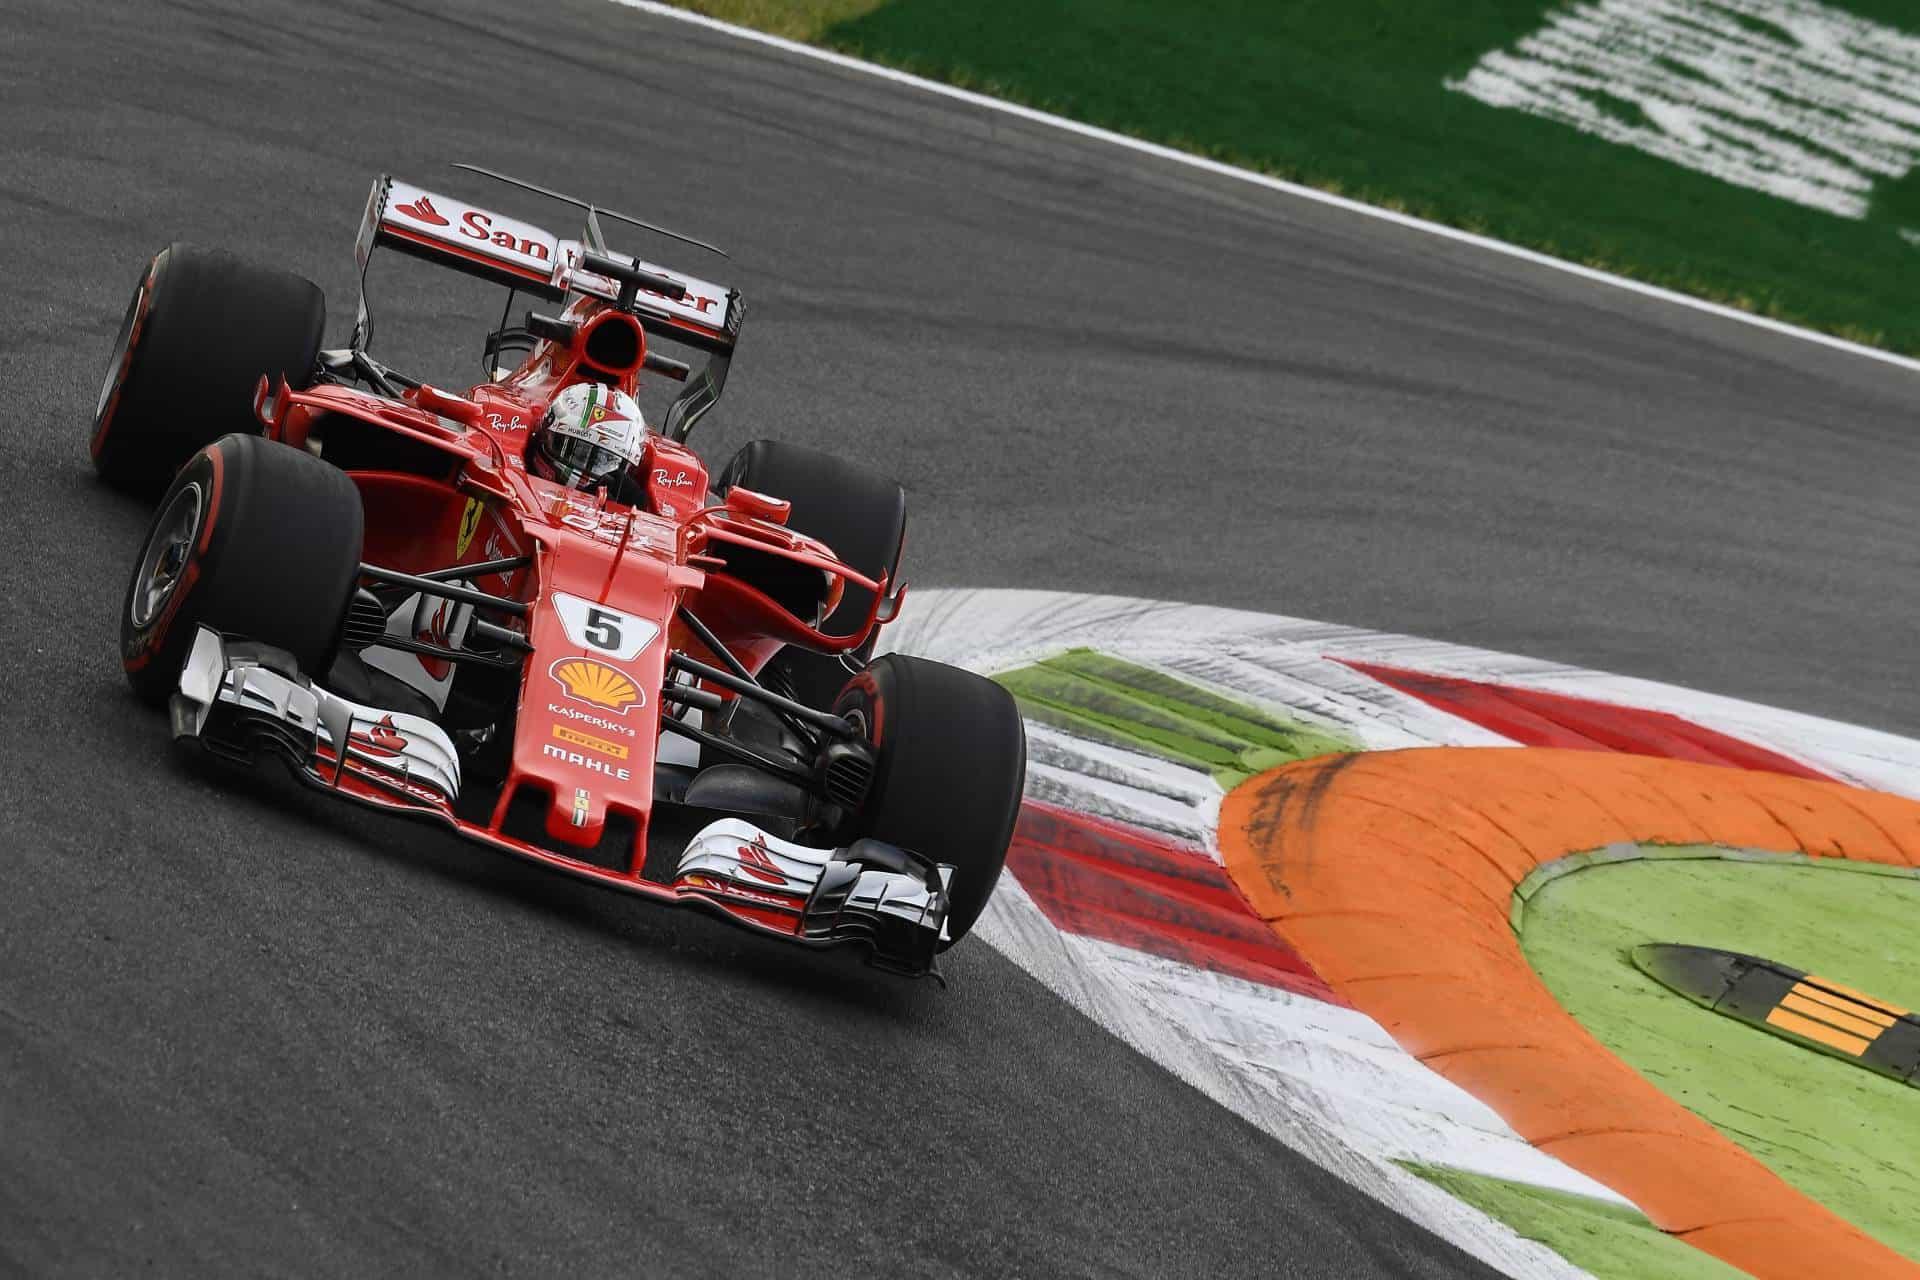 Vettel-Ferrari-SF70H-Italian-GP-F1-2017-Monza-first-chicane-Photo-Ferrari